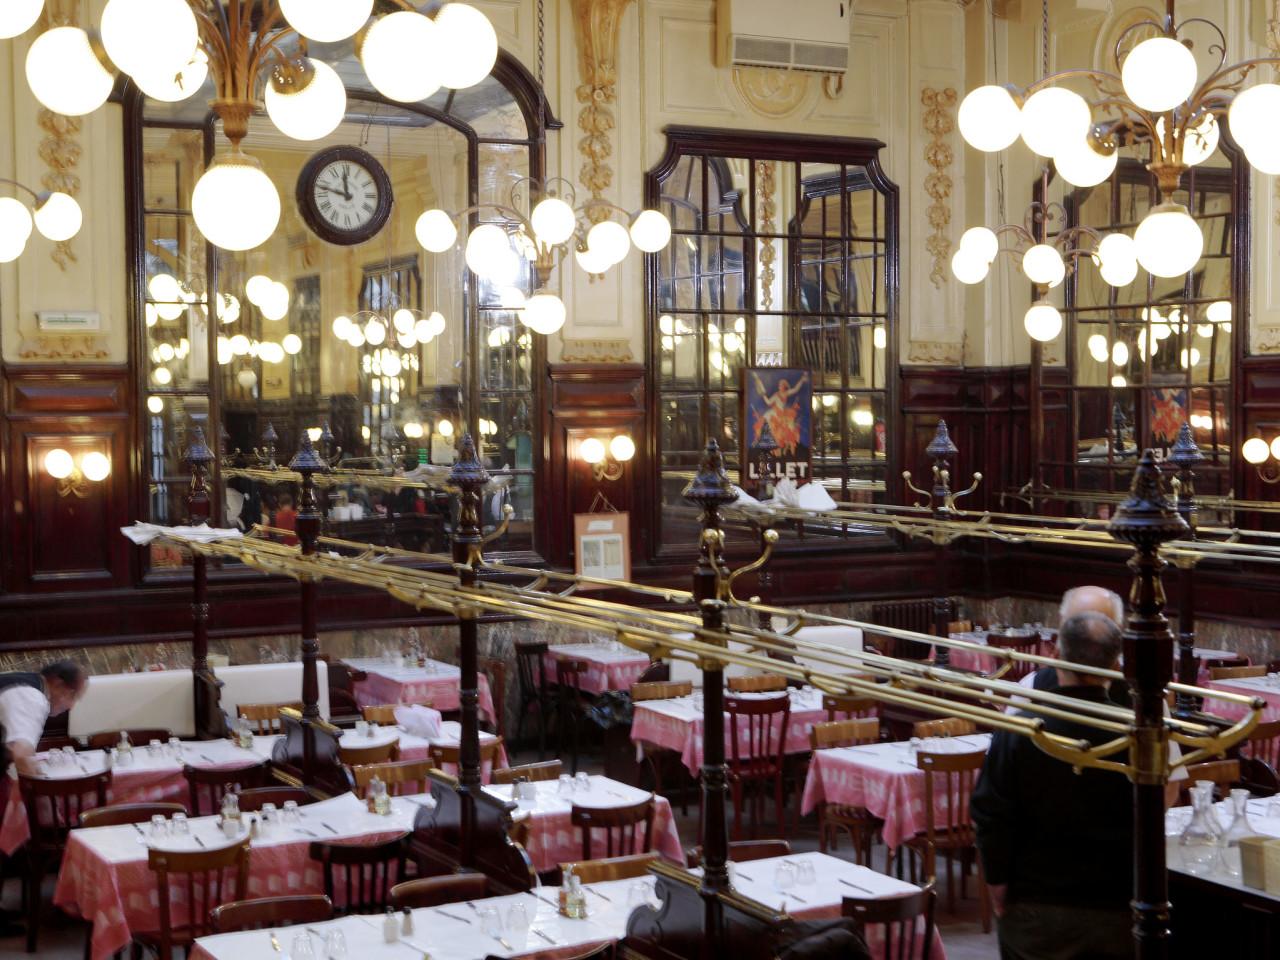 Dove mangiare a Parigi spendendo poco | Ristoranti economici a Parigi